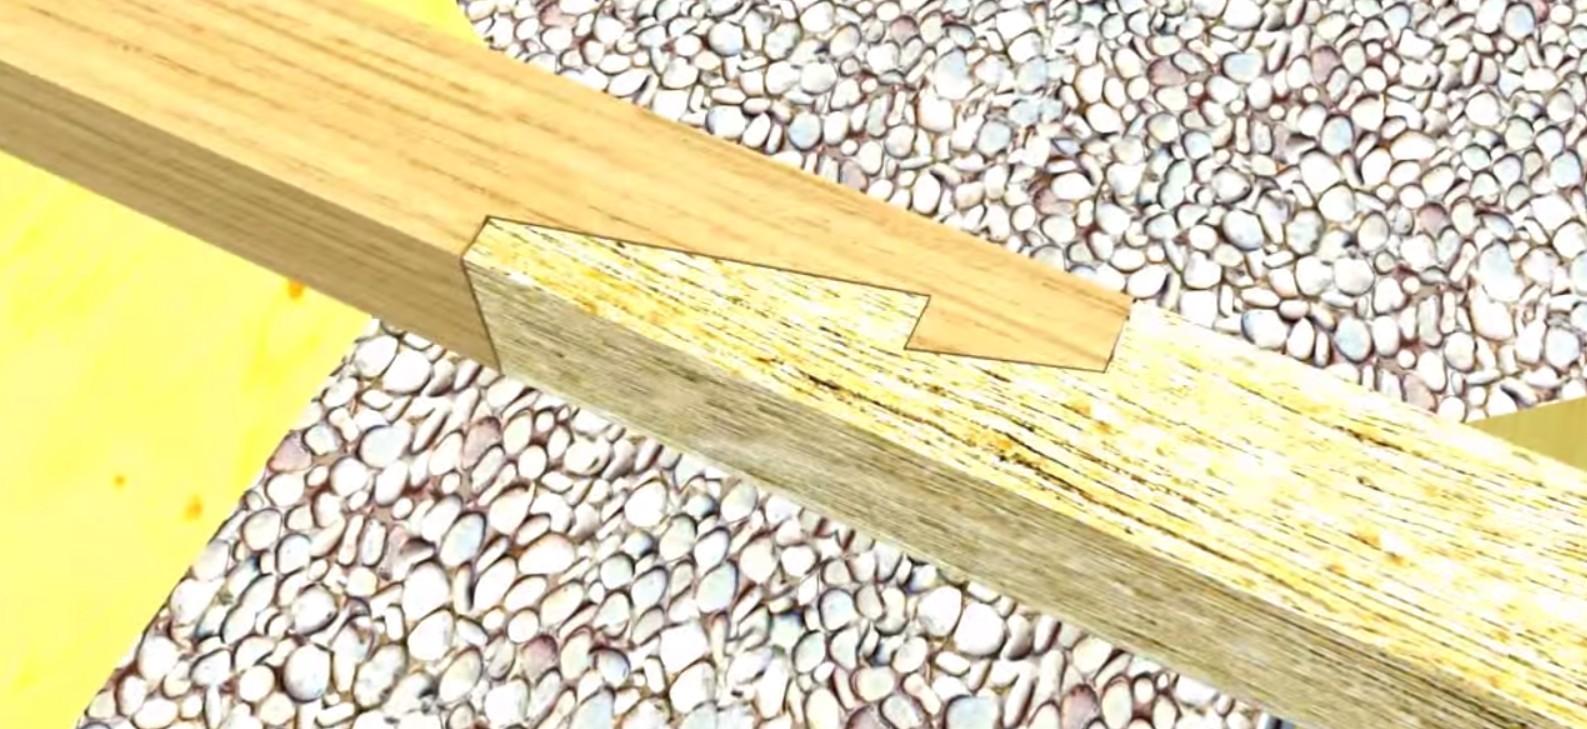 Соединение бруса в замок фото